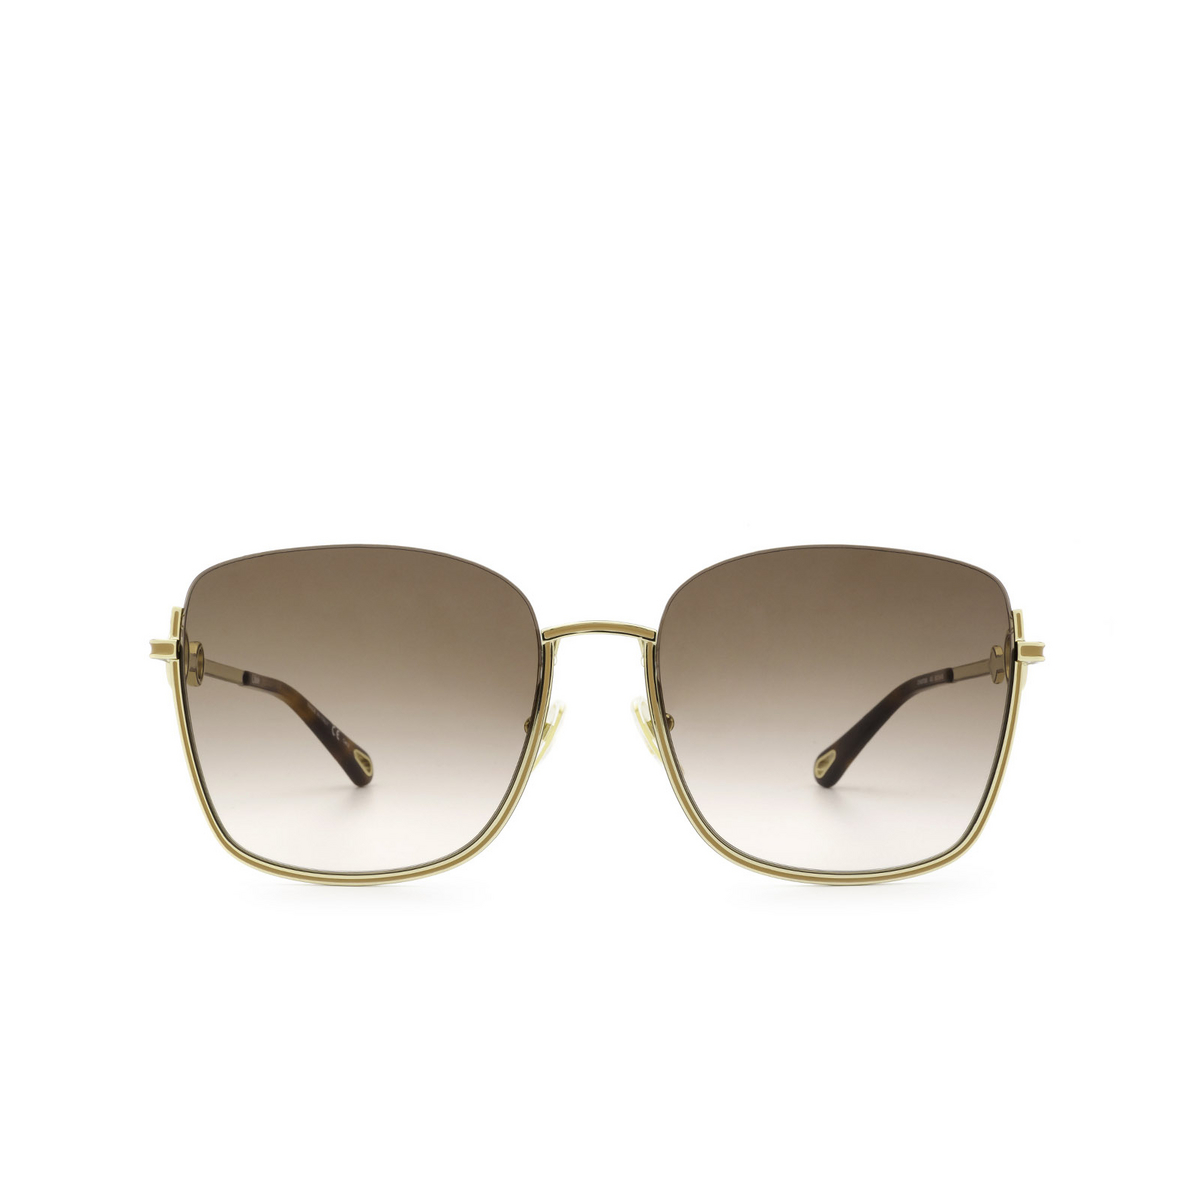 Chloé® Square Sunglasses: CH0070SK color Gold 003 - front view.